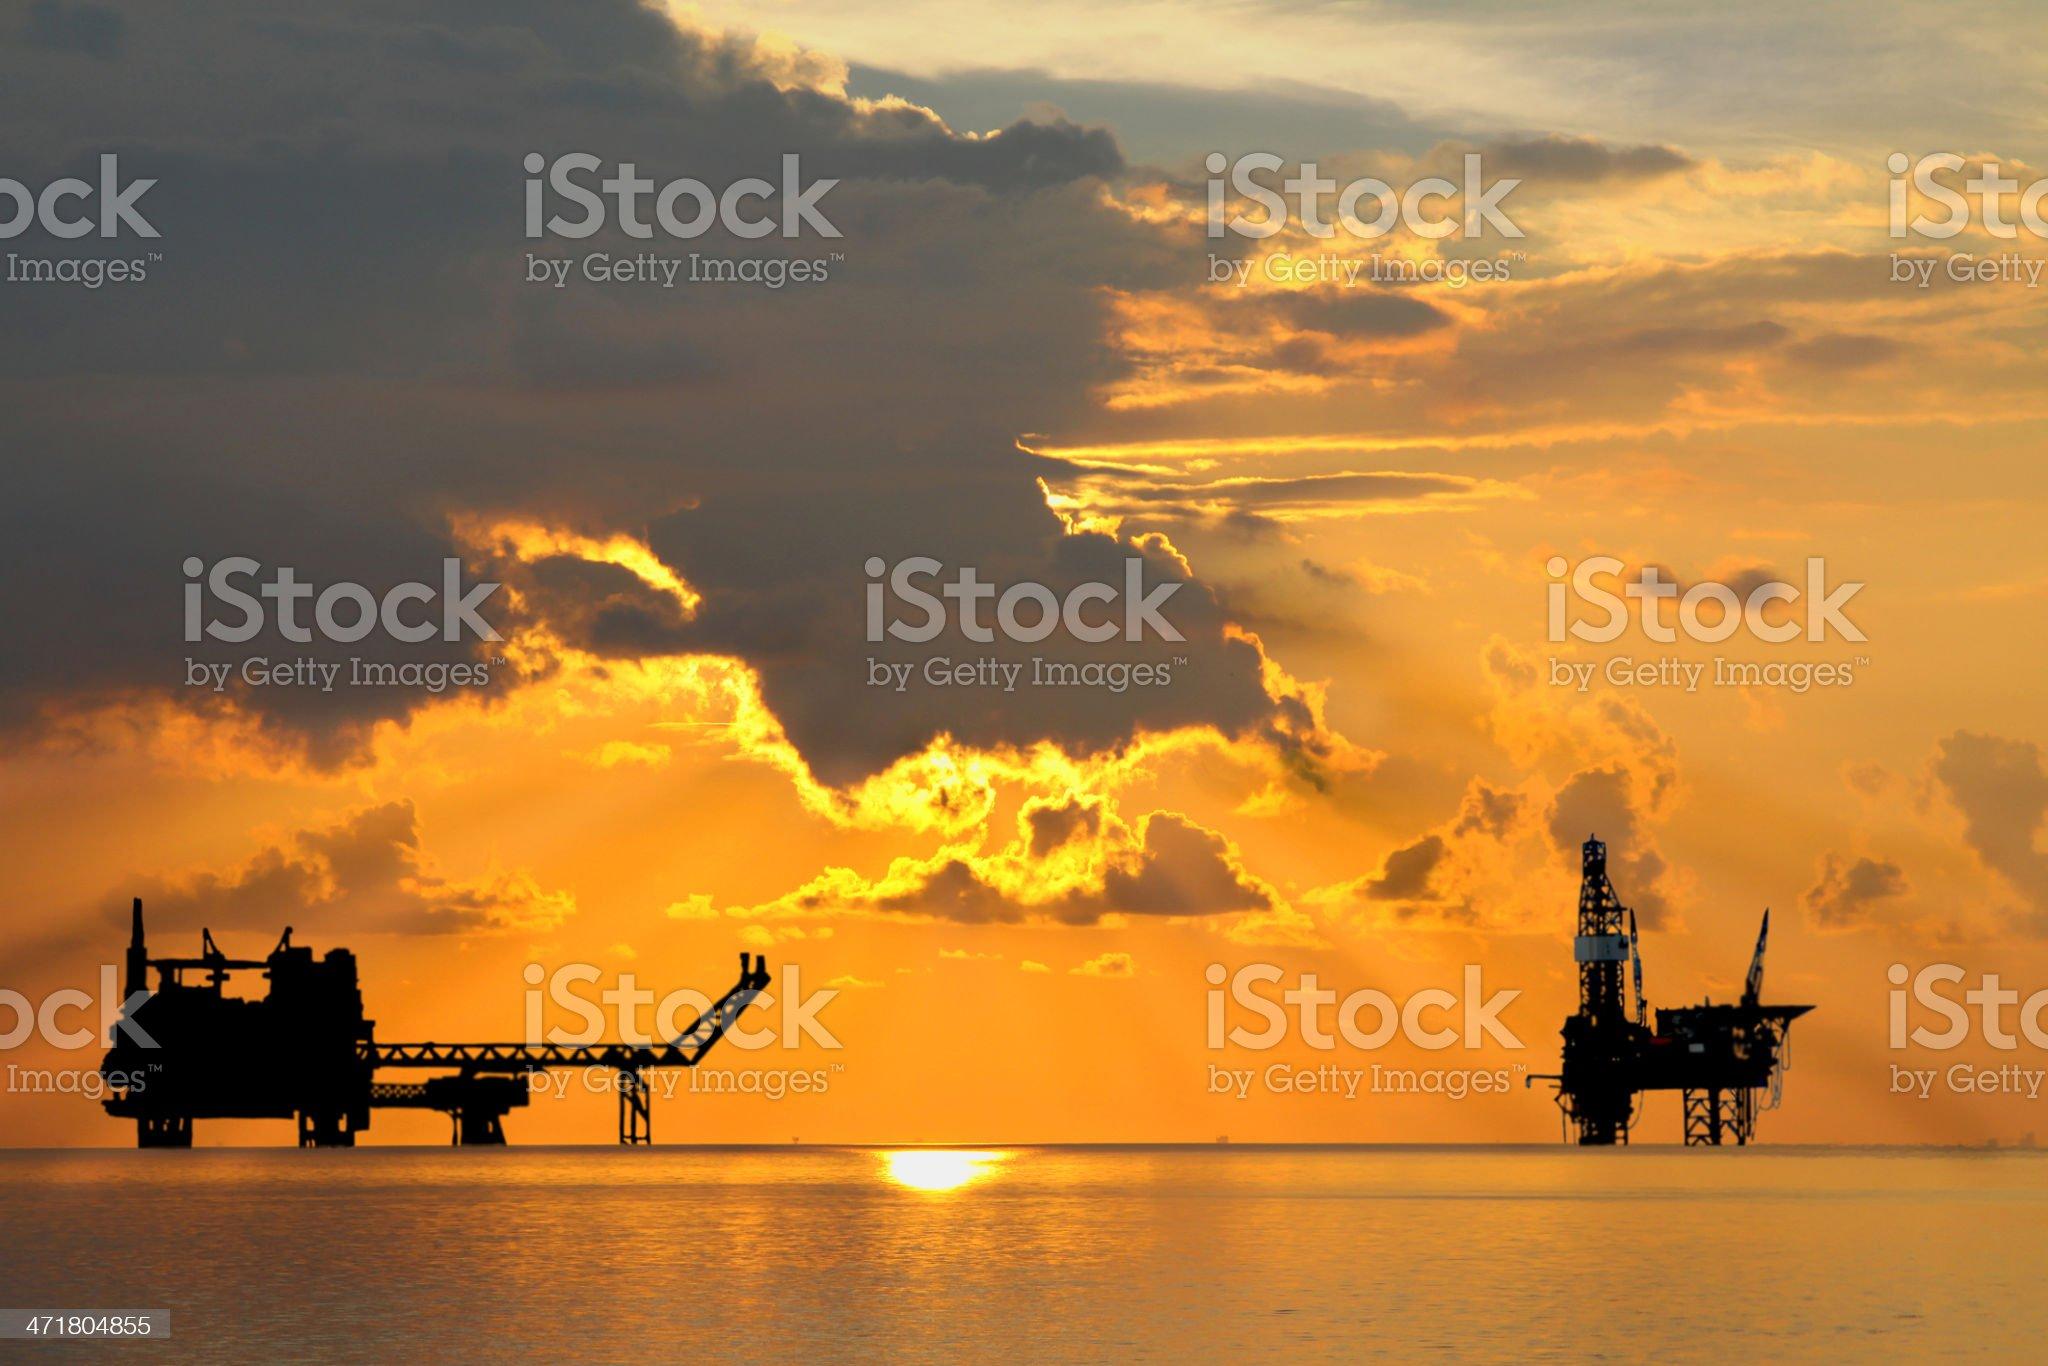 Rig and Platform royalty-free stock photo